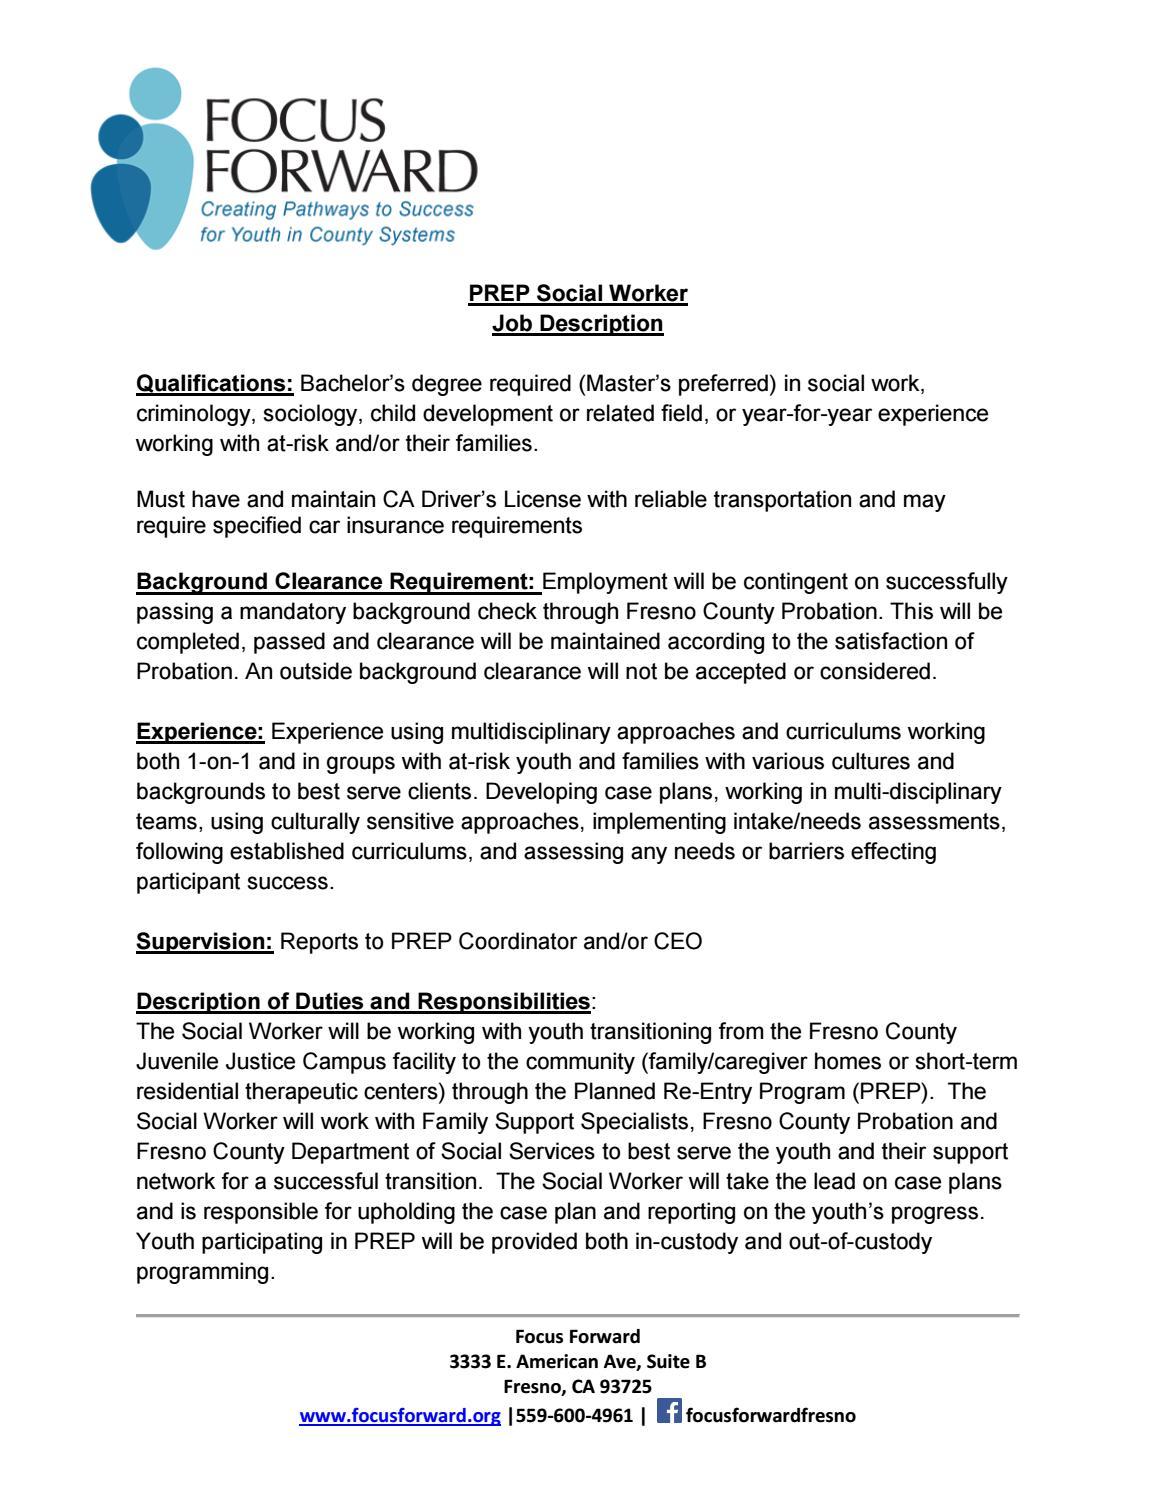 Prep Social Worker Job Description 2017 By Focus Foward Issuu